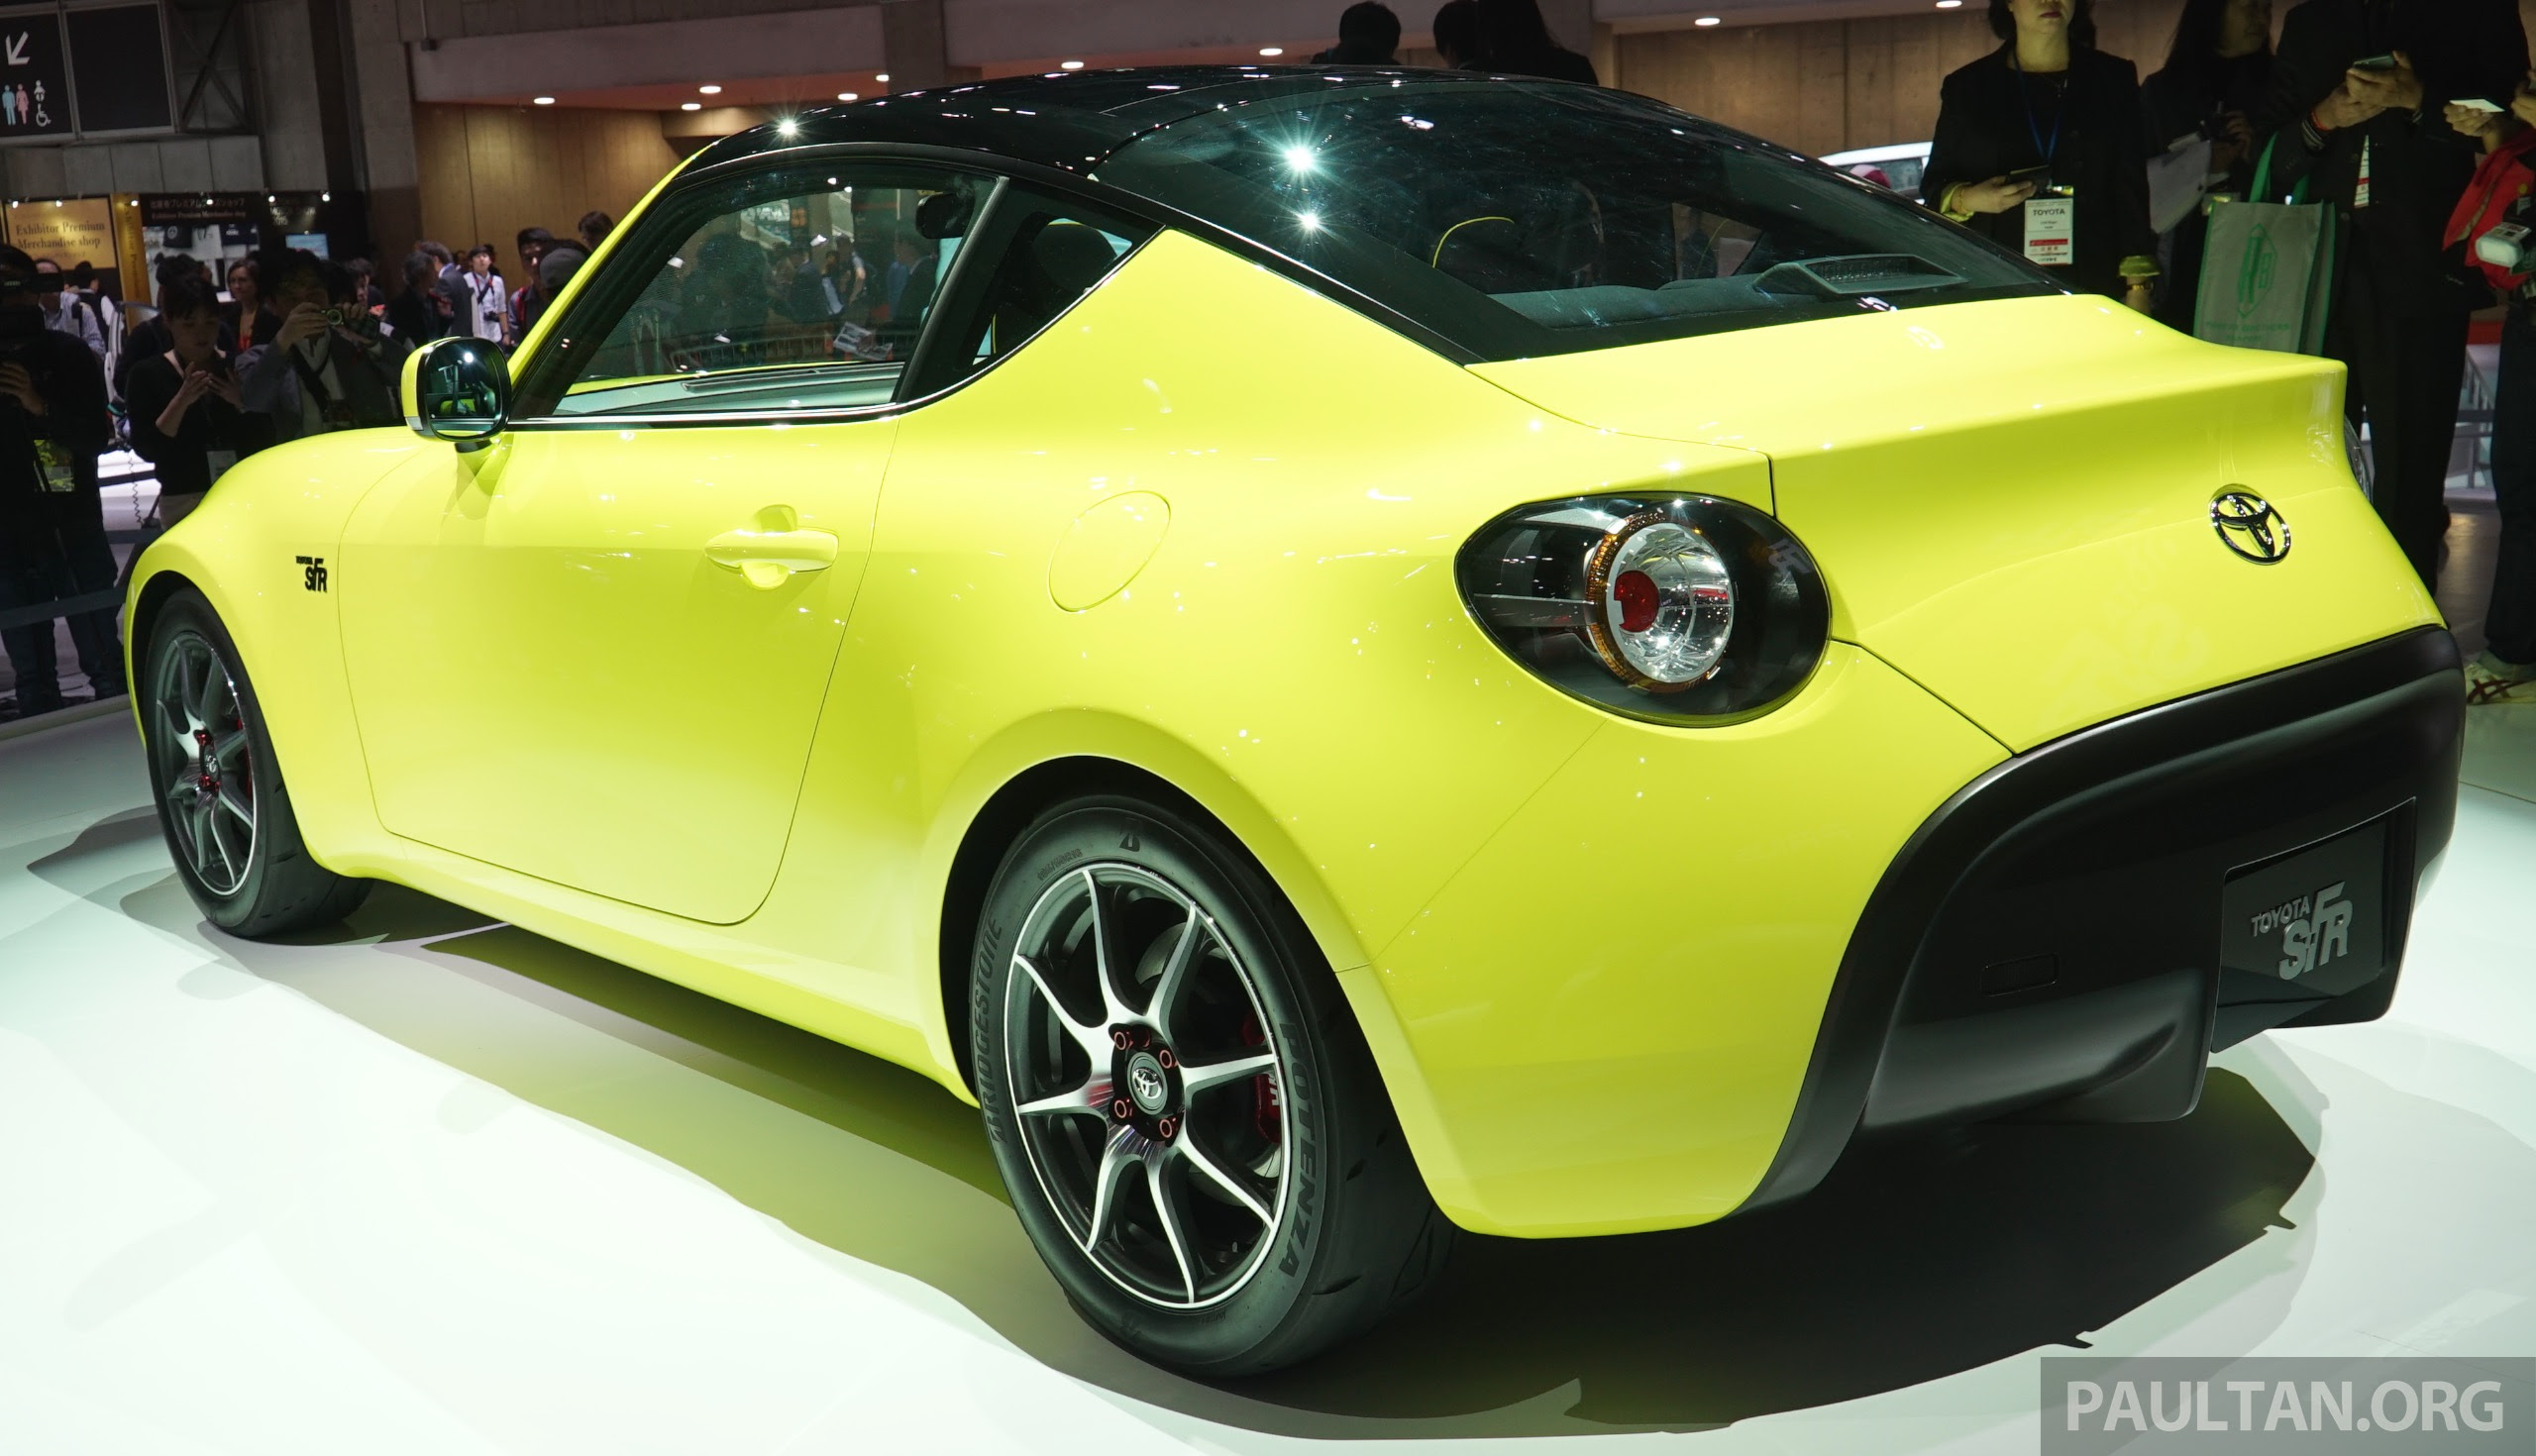 Tokyo 2015: Toyota SFR \u2013 new entrylevel sports car Image 398485